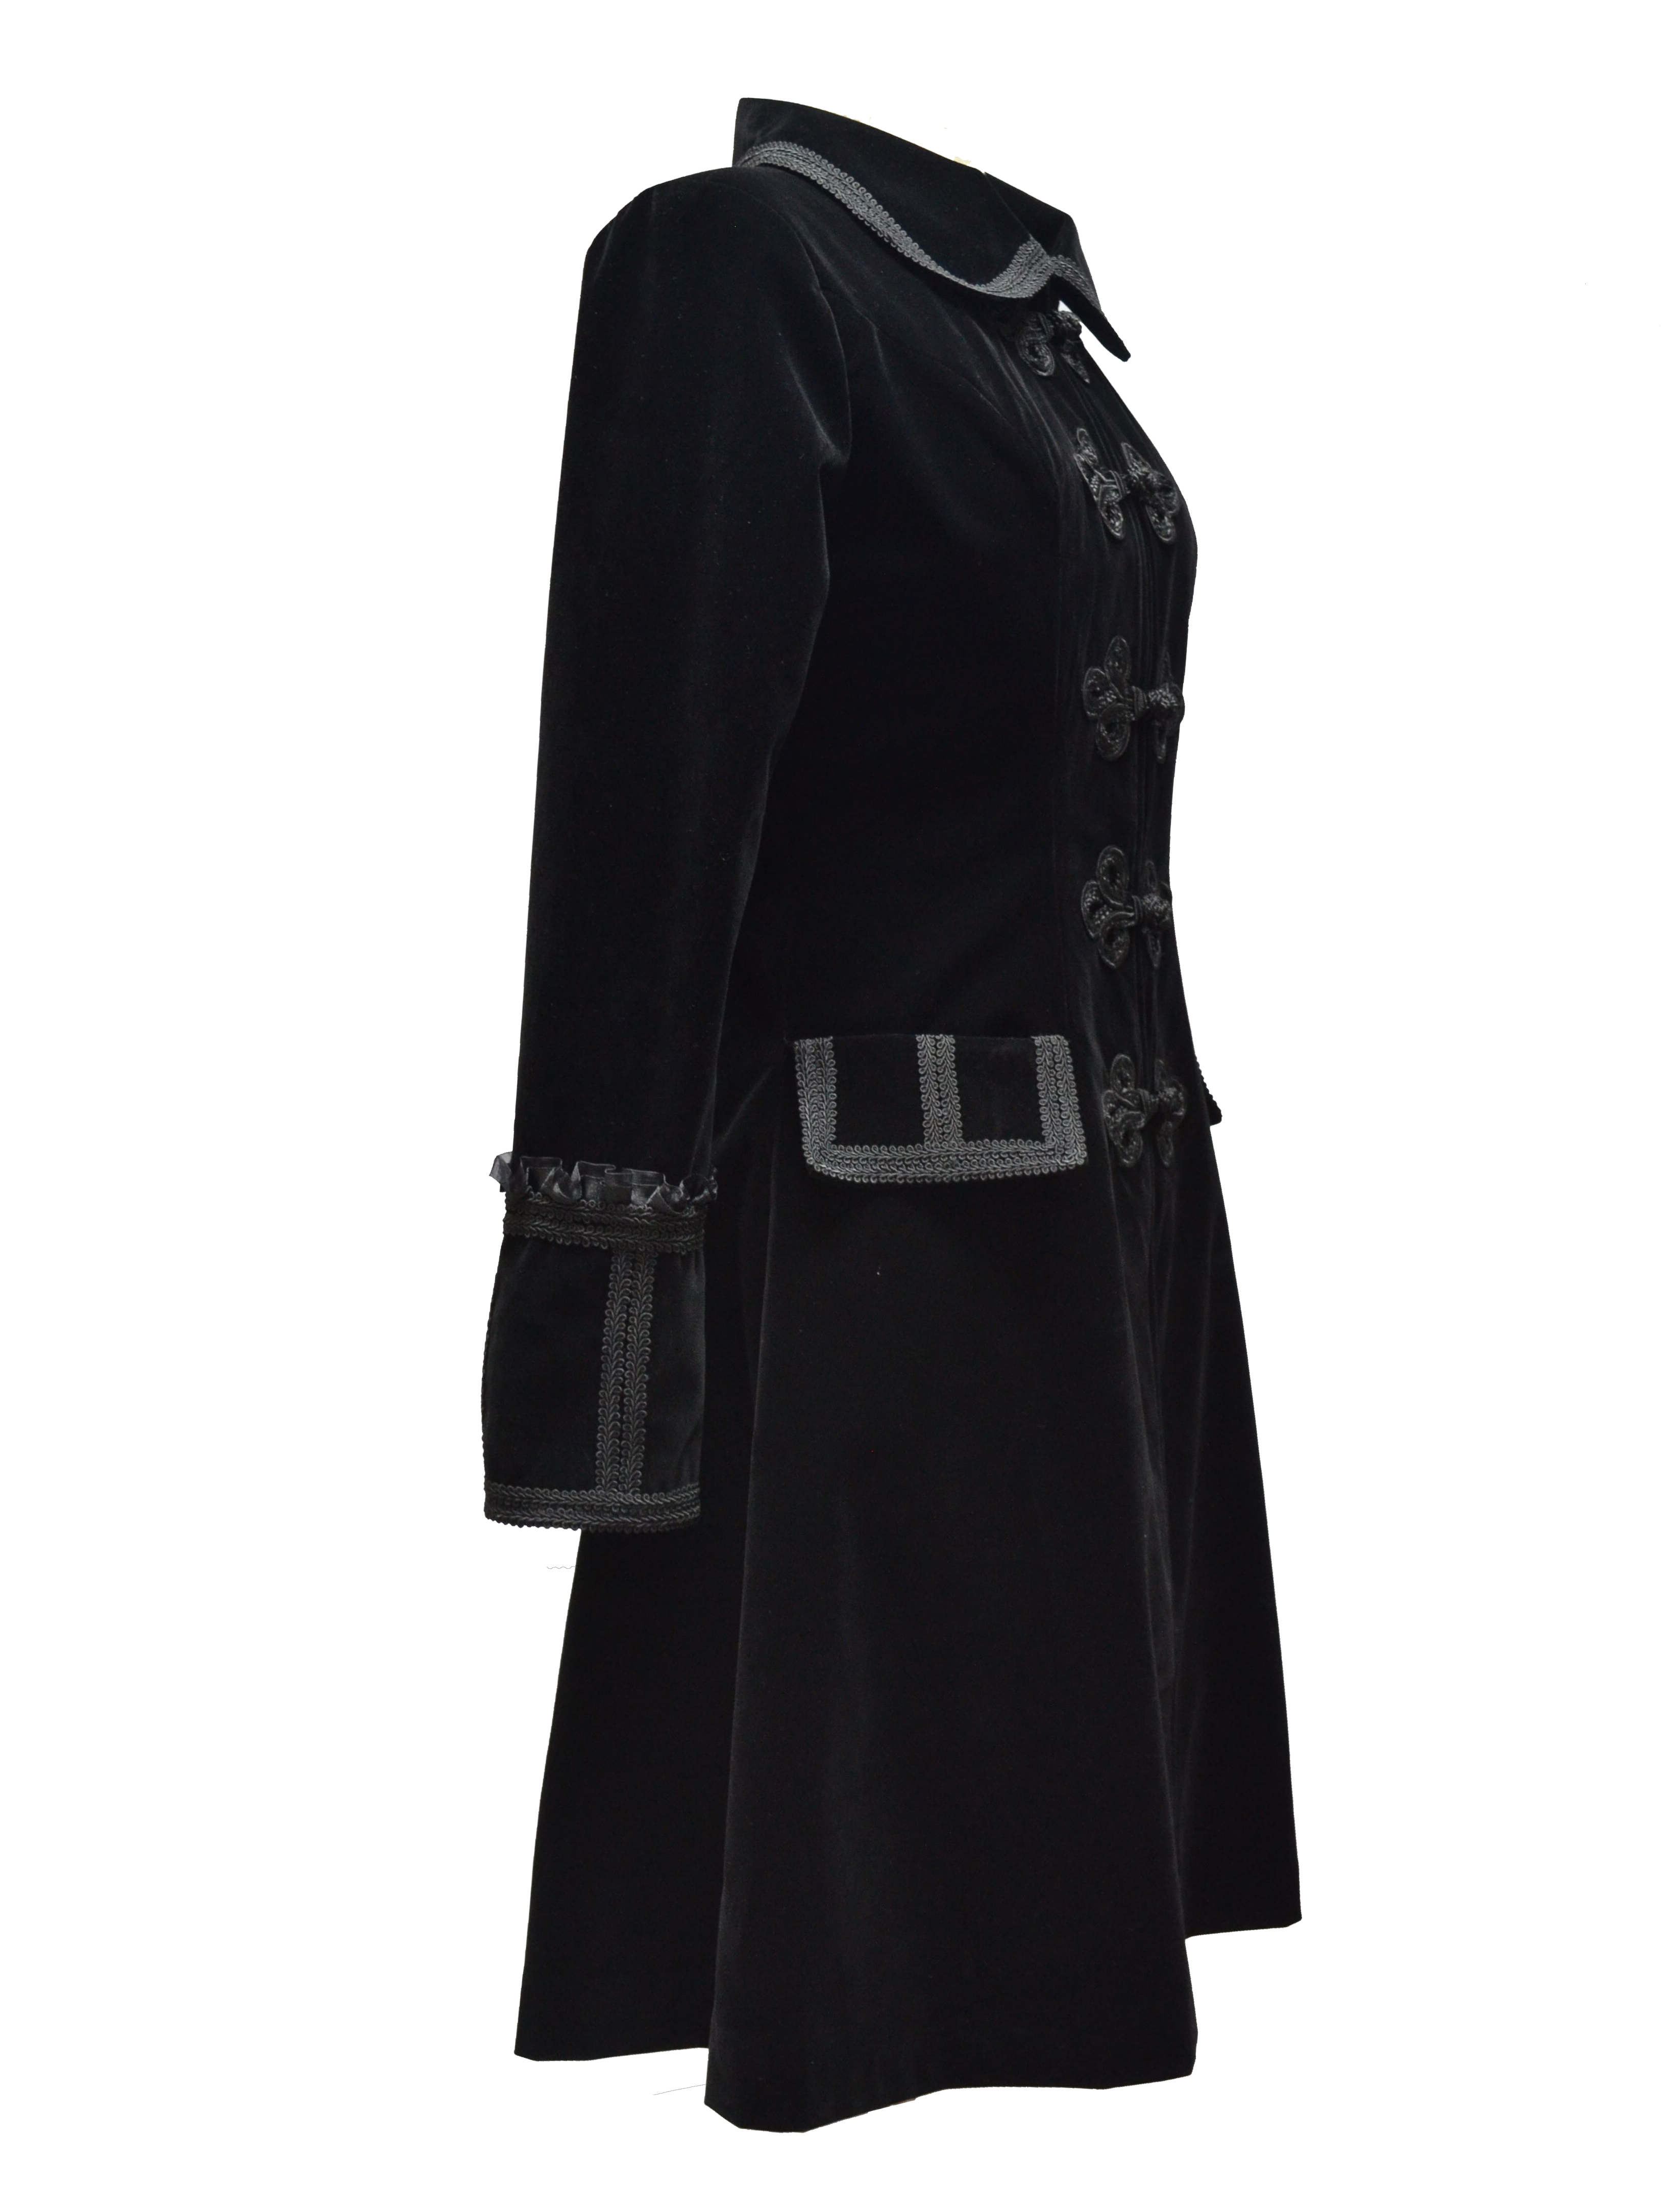 black_chinese_style_gothic_long_coat_for_women_coats_4.jpg